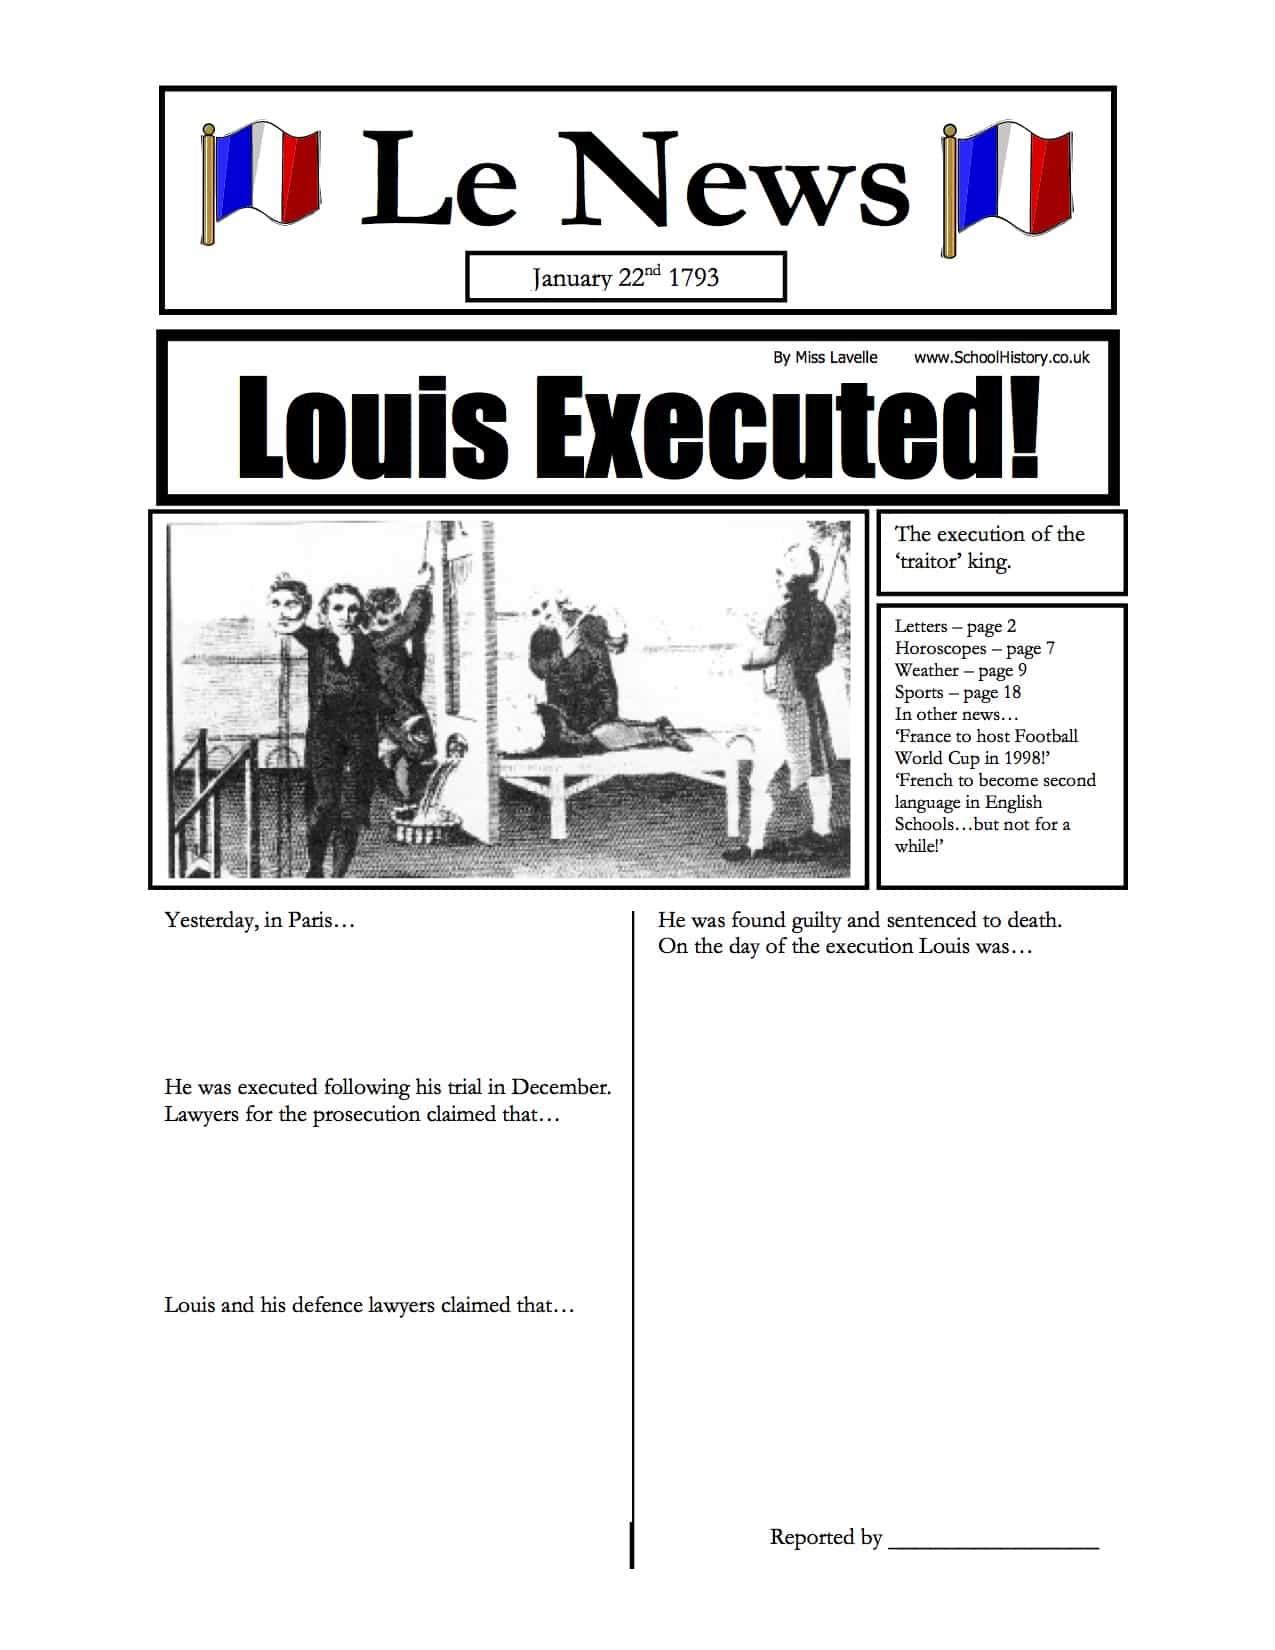 king louis executed newspaper worksheet history resources. Black Bedroom Furniture Sets. Home Design Ideas